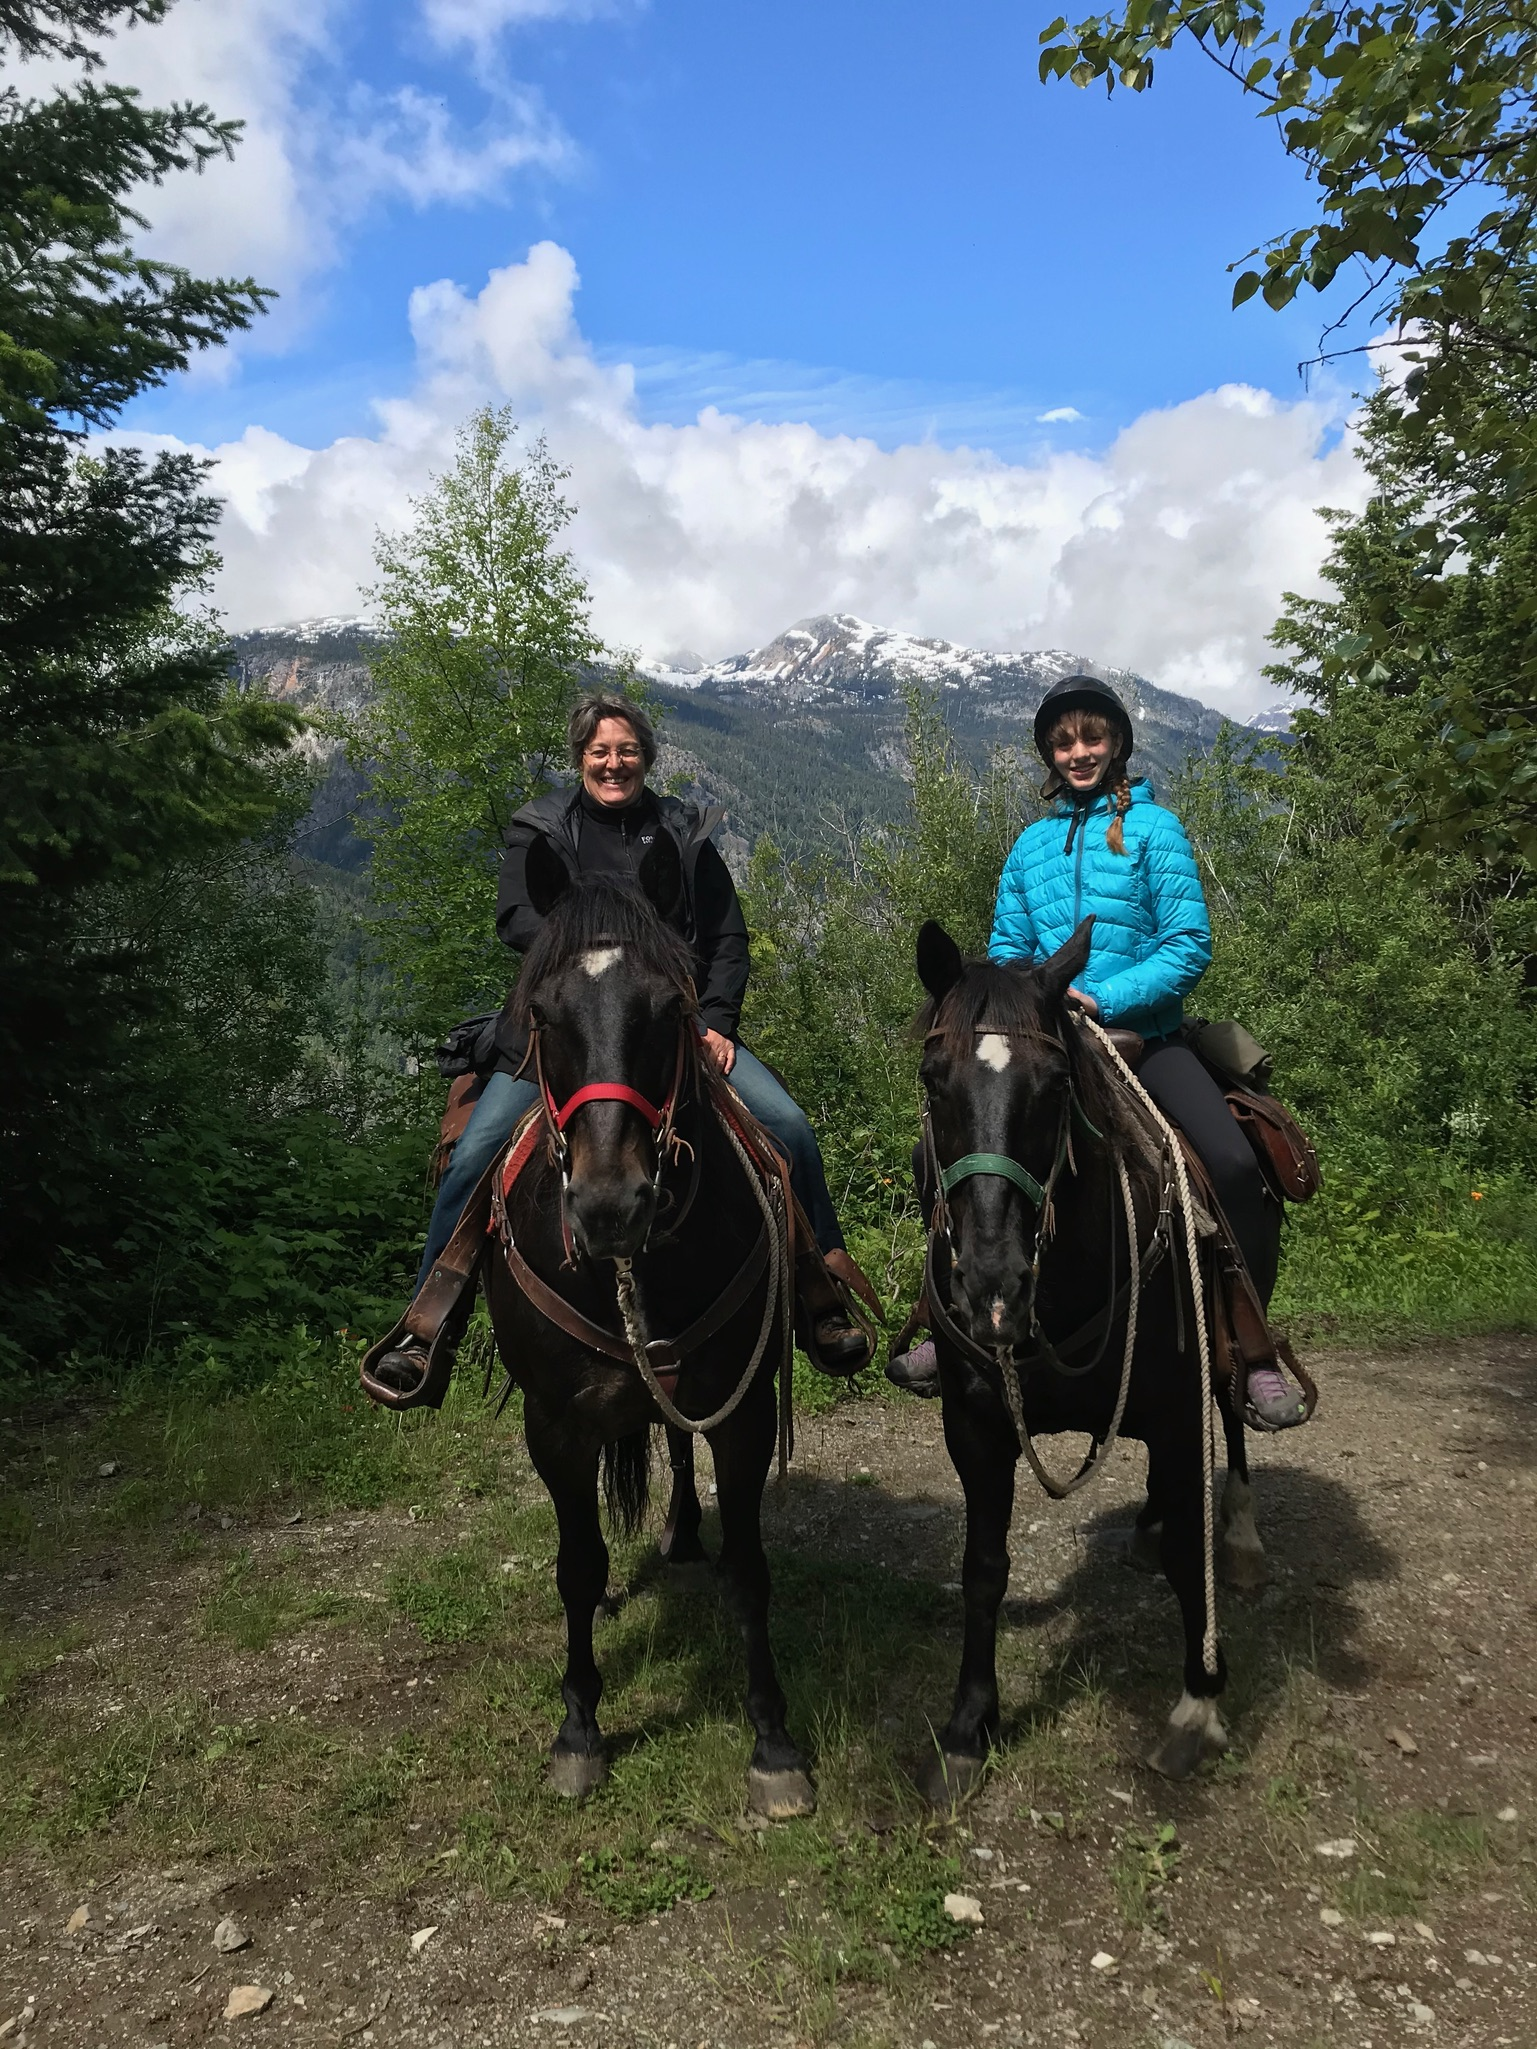 Full Day Horseback Ride in Canada: Horseriding adventure in BC